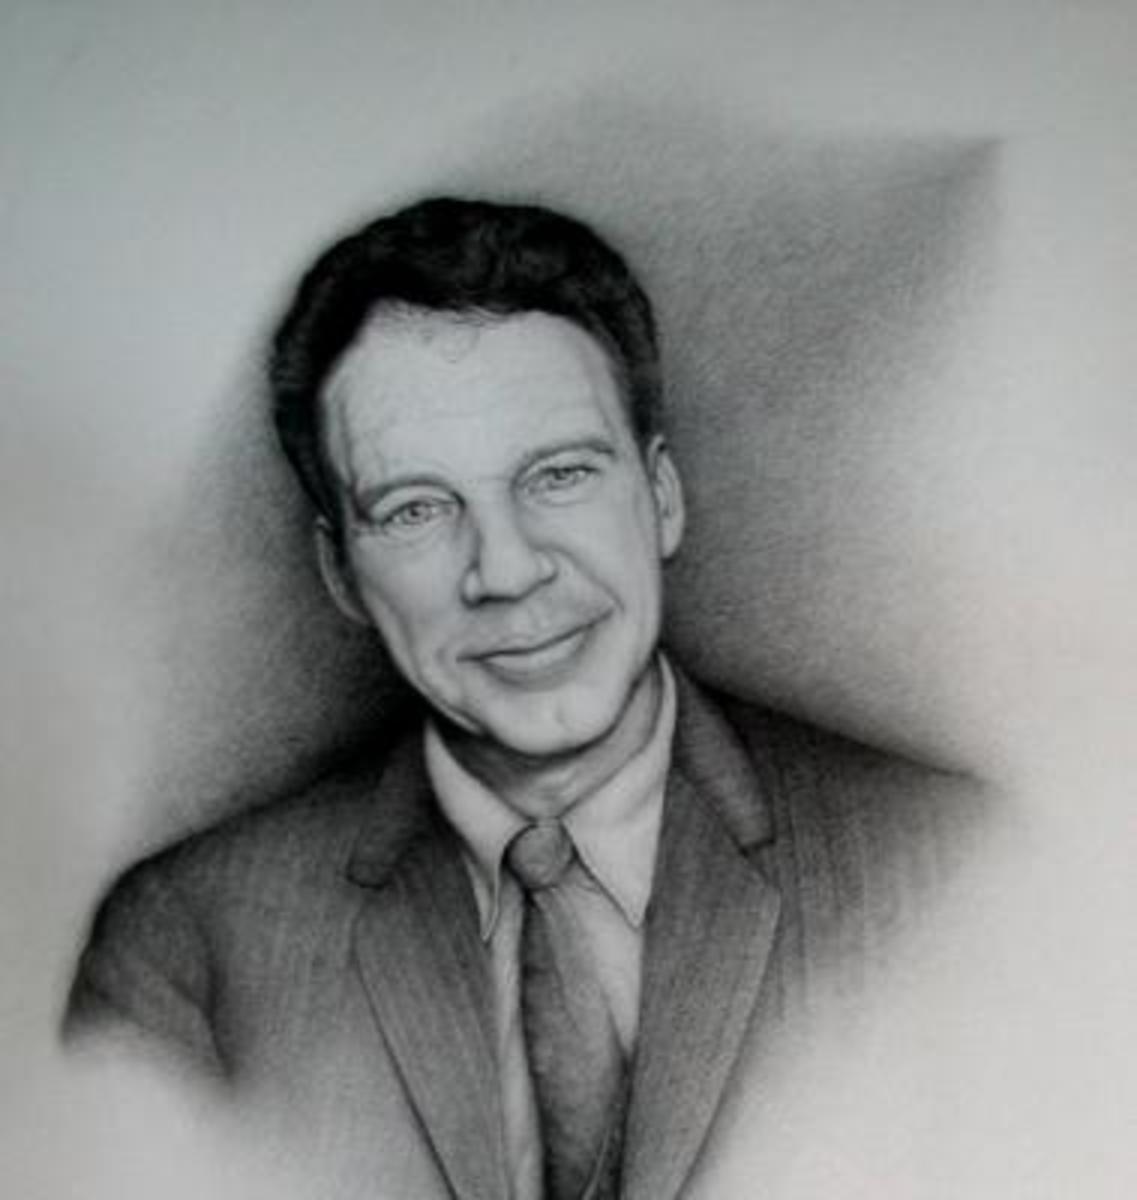 Alex Jordan Jr. Creator Of House On The Rock